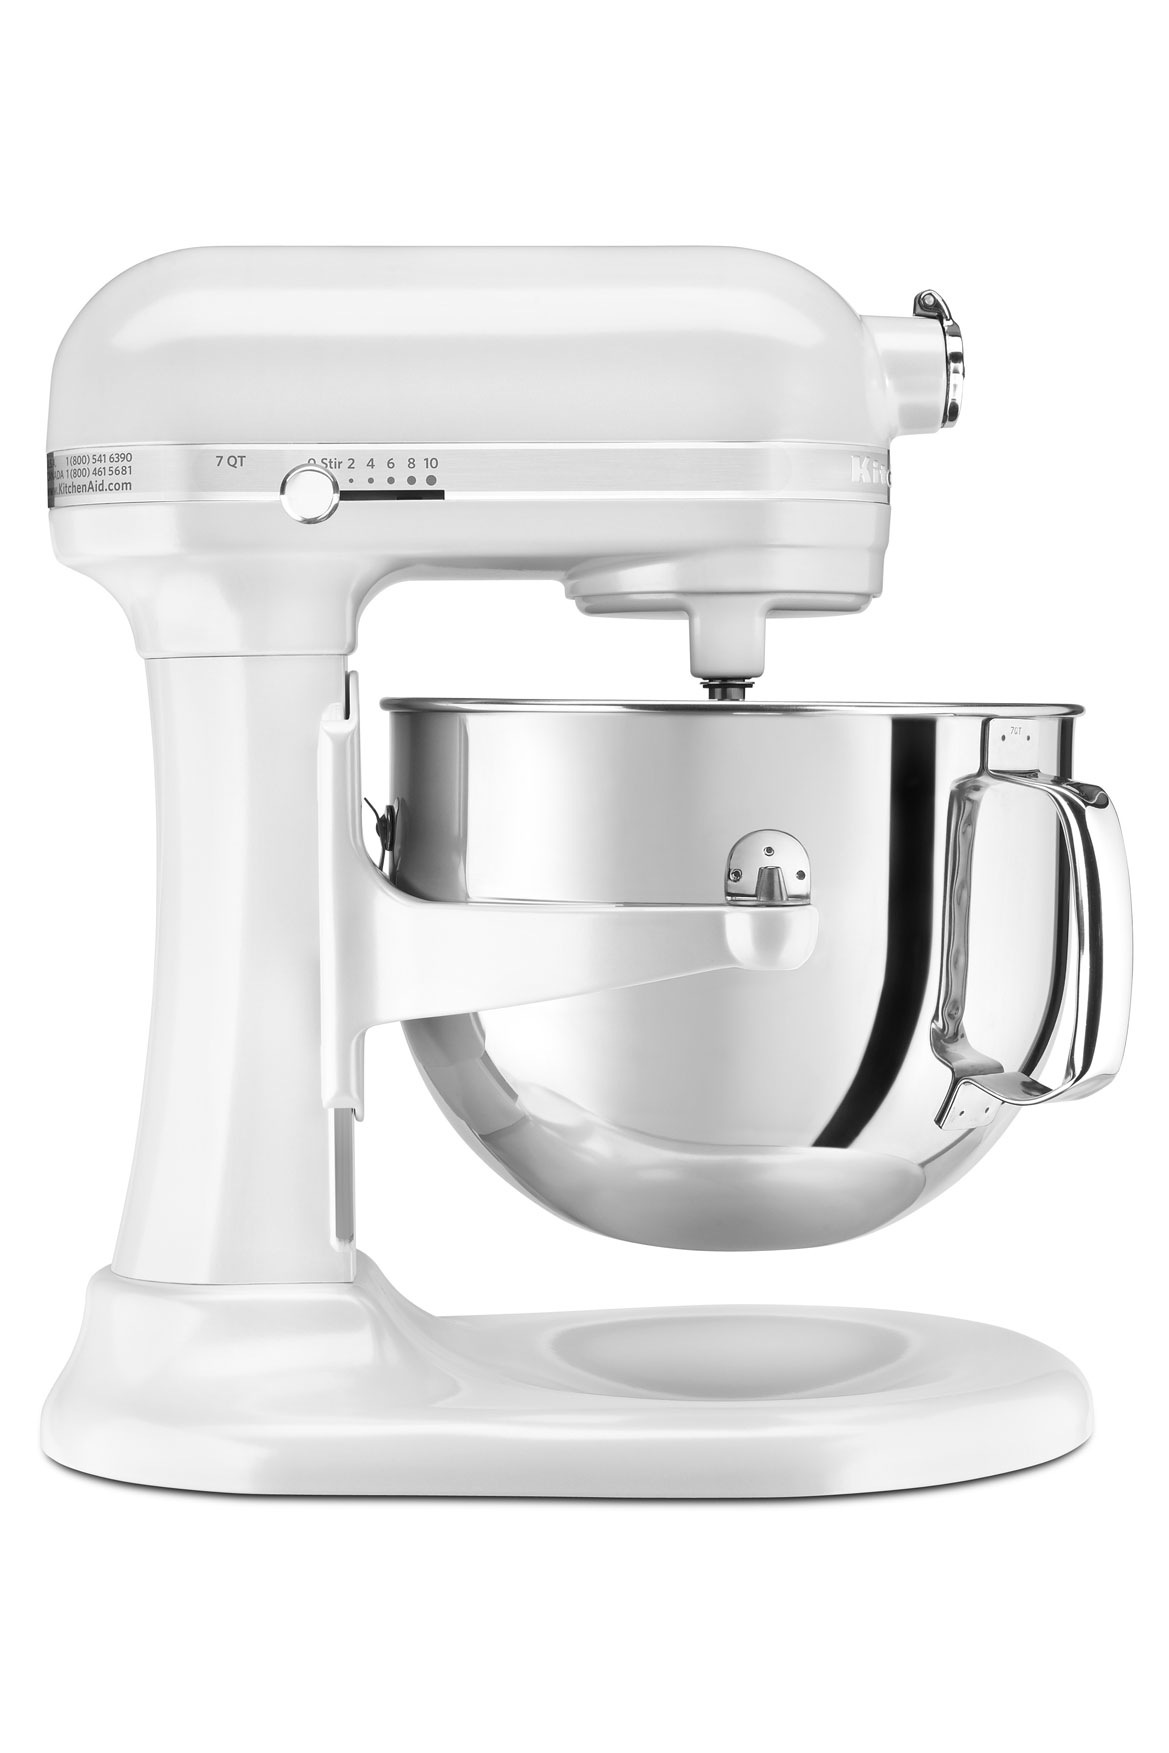 Uncategorized Myer Kitchen Appliances kitchenaid ksm7581 proline mixer frost pearl5ksm7581afp myer online